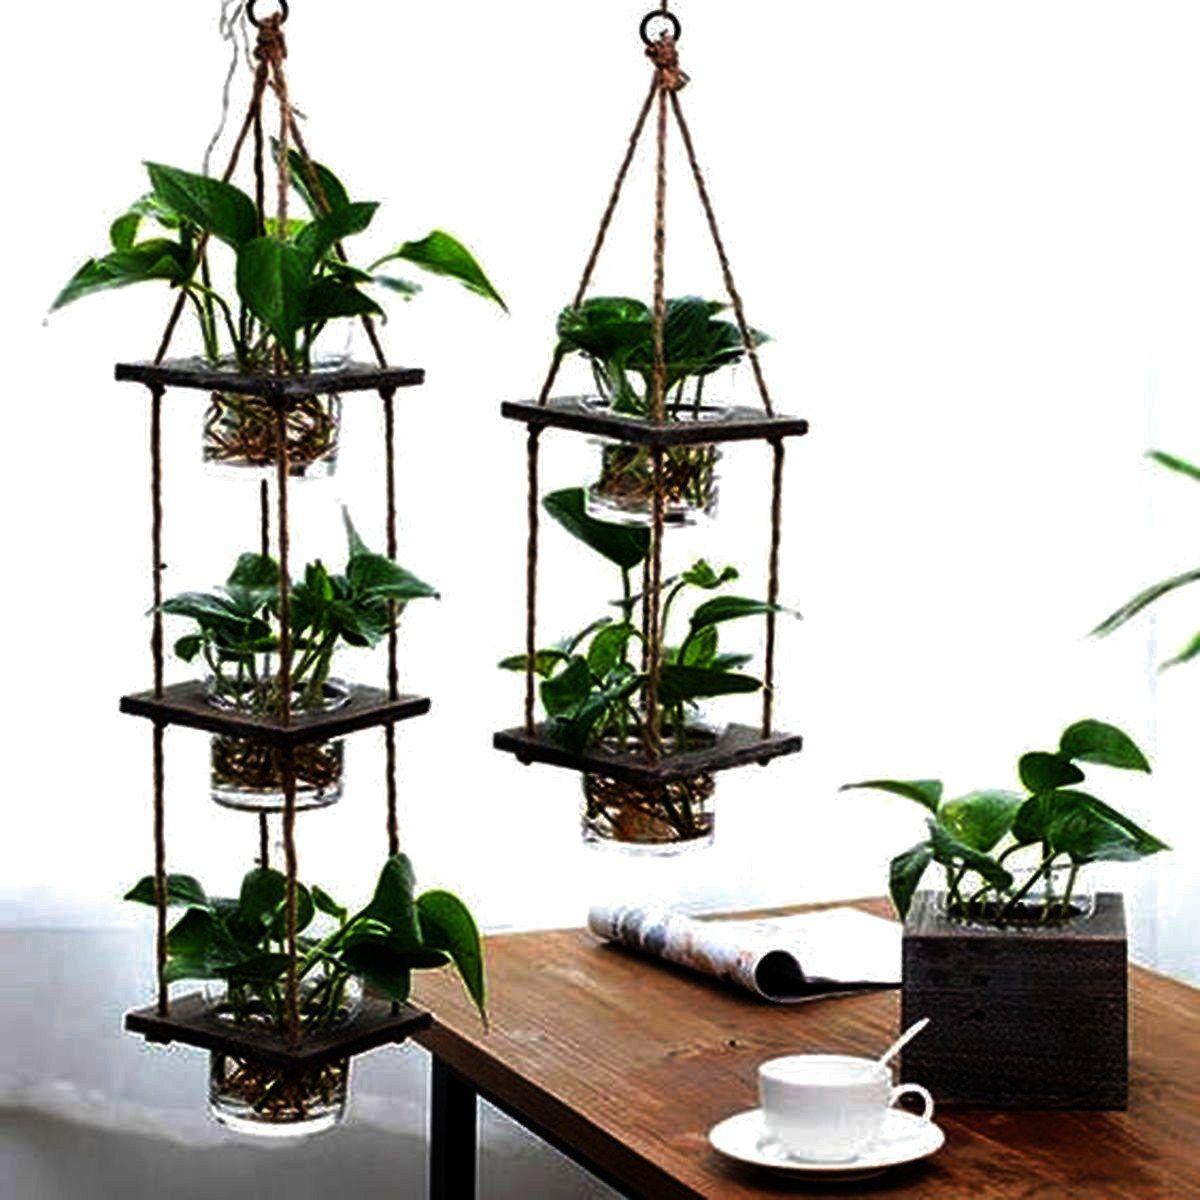 52 Favourite Vertical Garden Design Ideas And Remodel ...